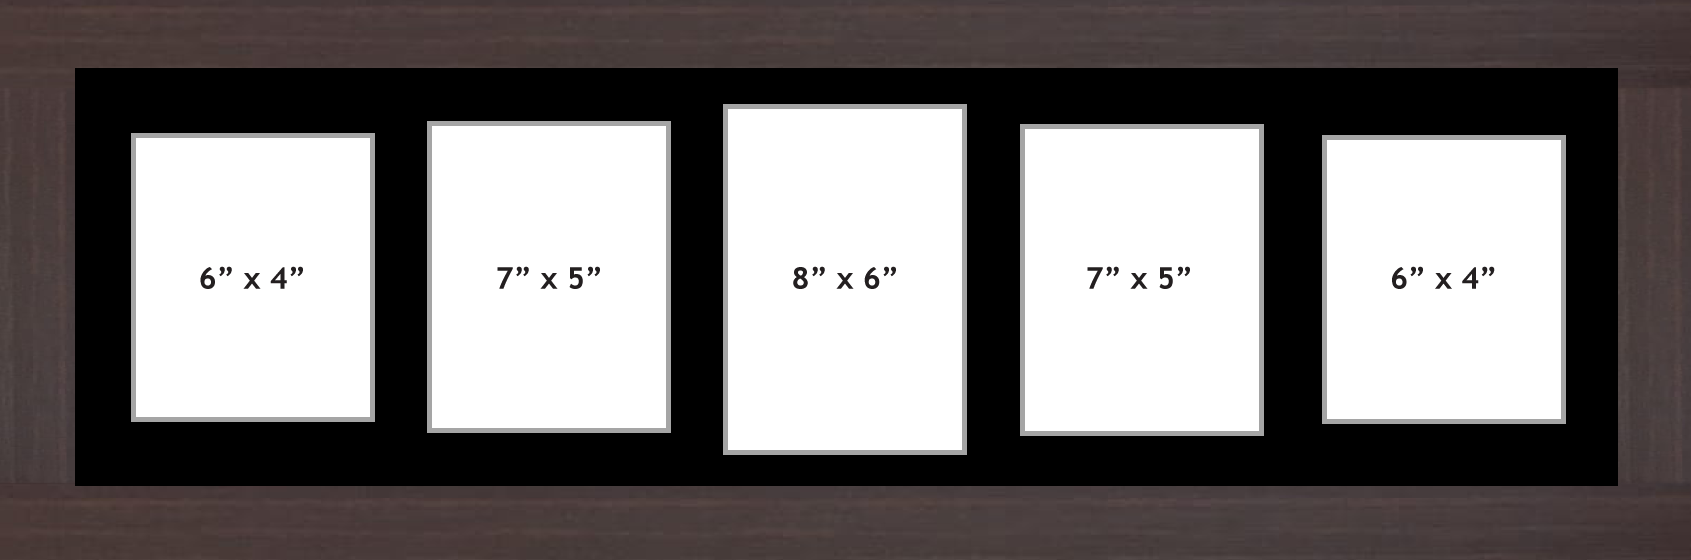 "Multi Aperture picture frame fits 5 (1 x 8""x6"", 2x7""x5"", 2x6""x4"") photos frames"